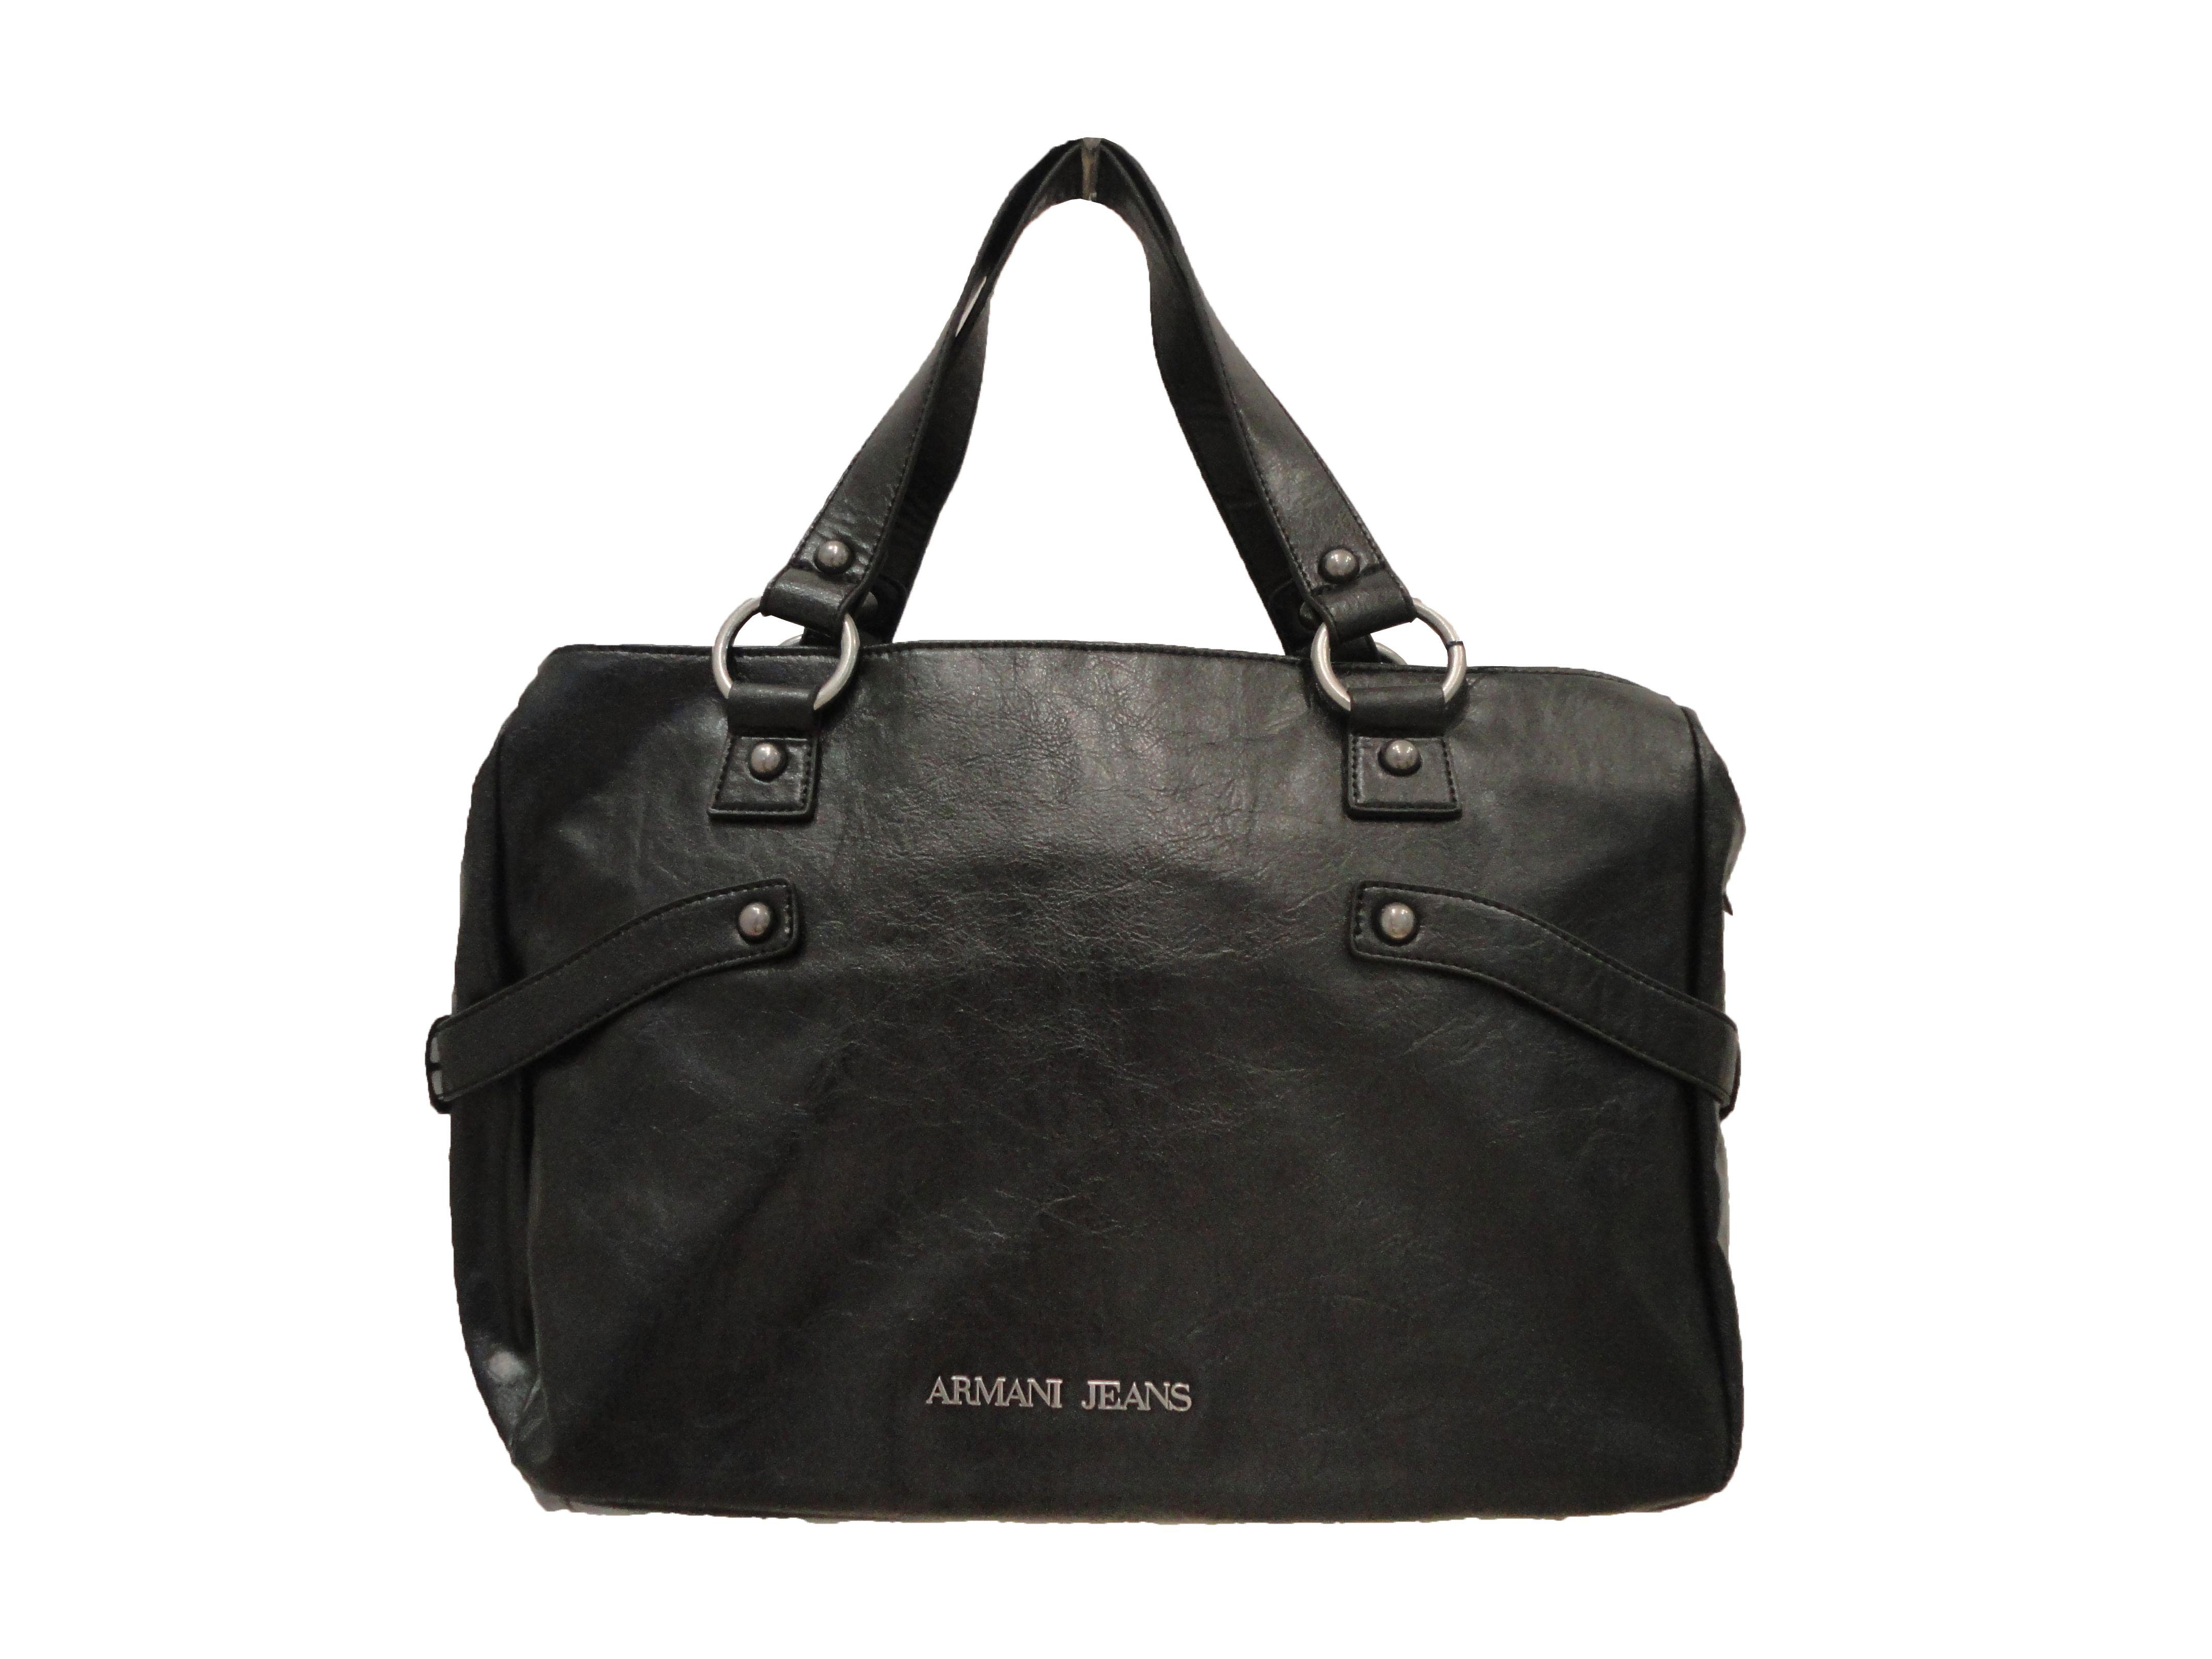 Las Armani Handbag Poseted By Houseoflabels Co Uk